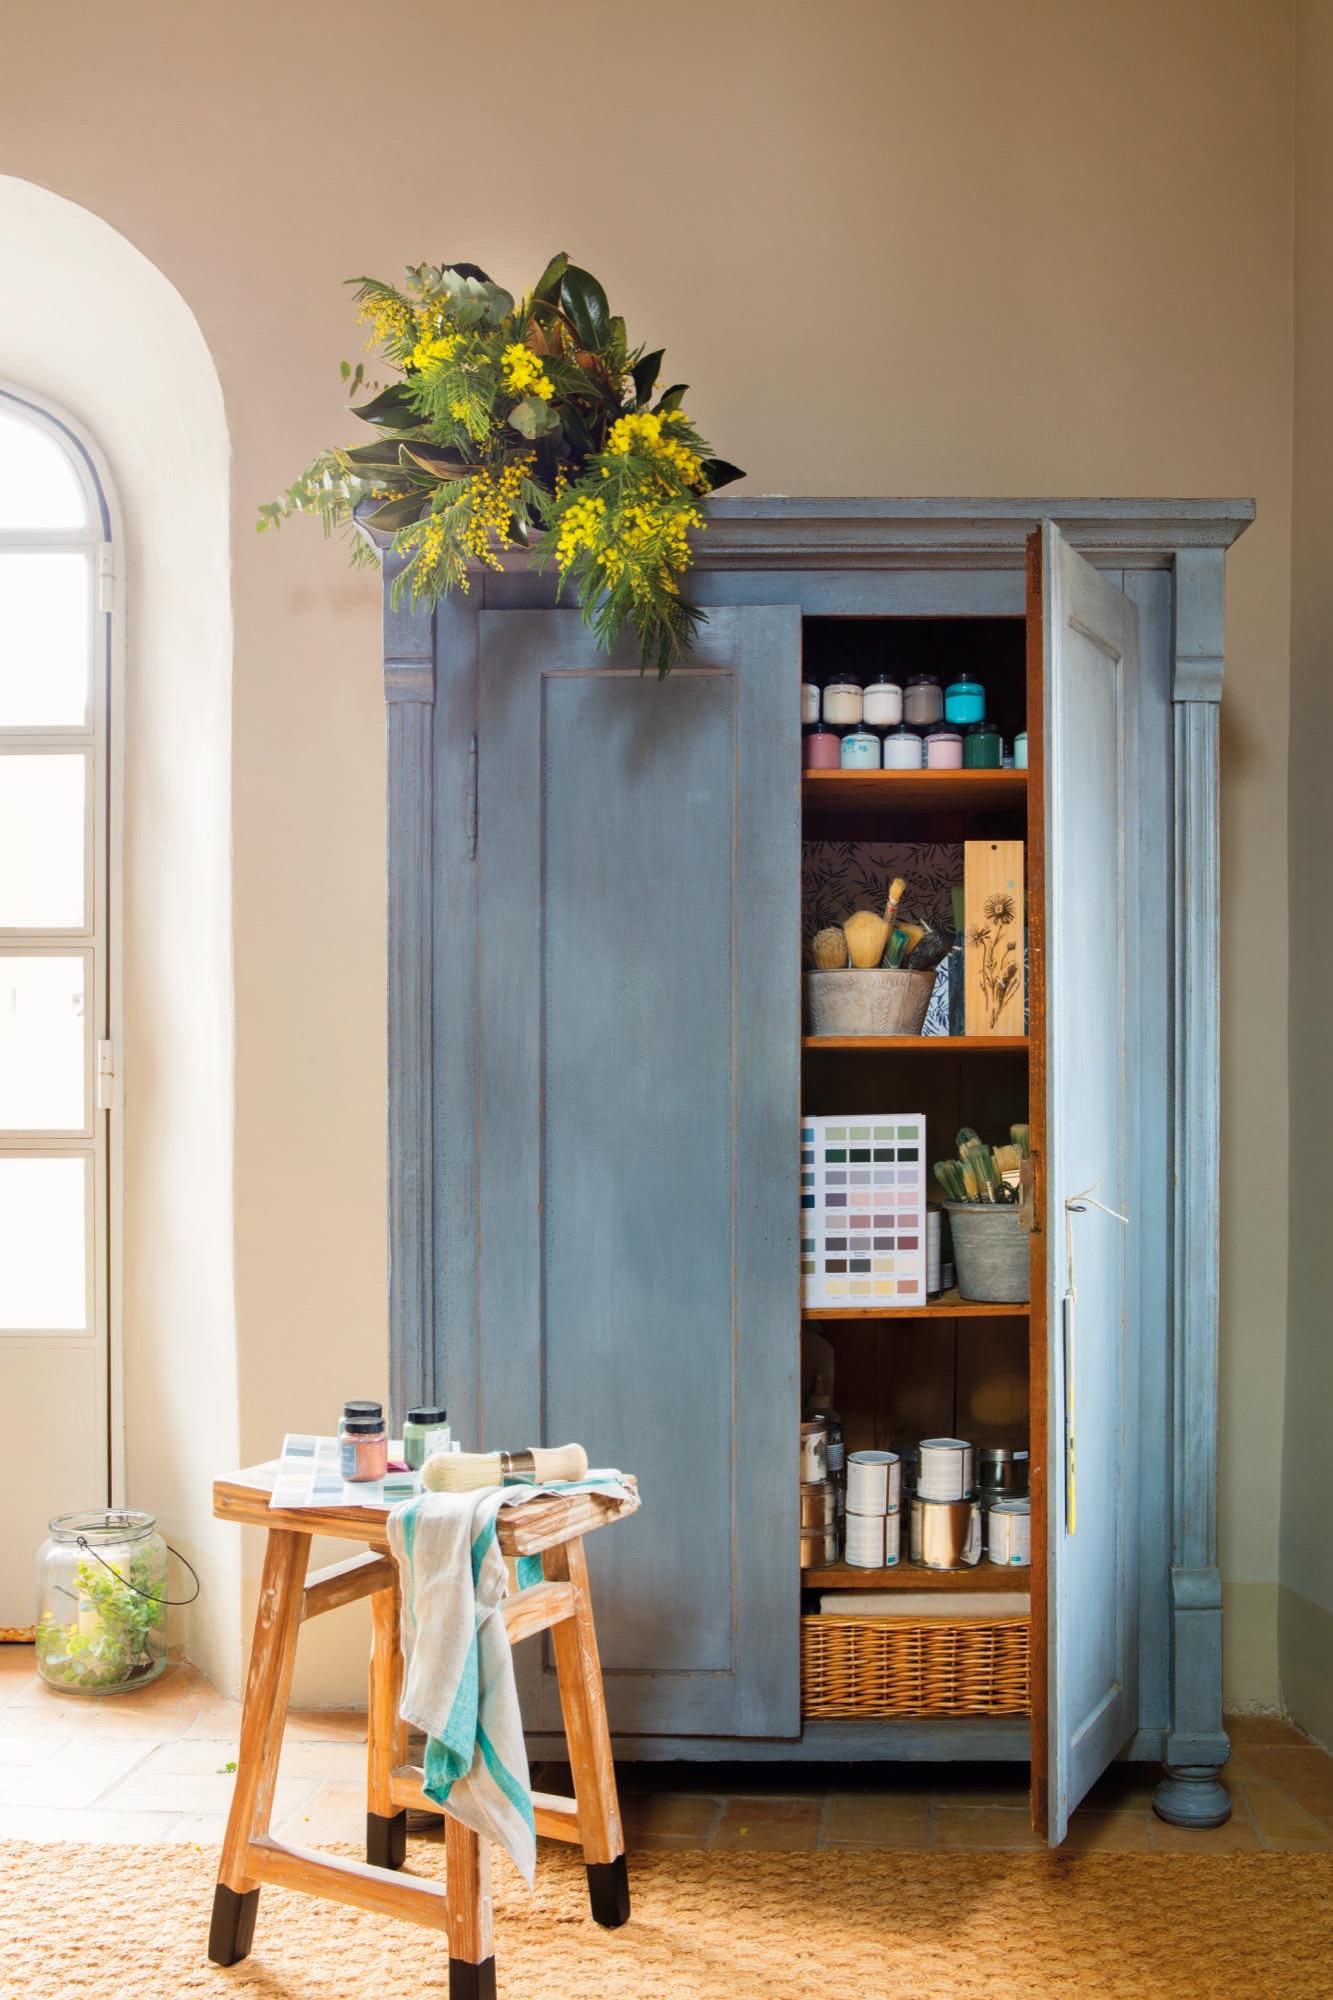 La casa con chalk paint de neus de crea decora recicla for Cocina pintura pato azul